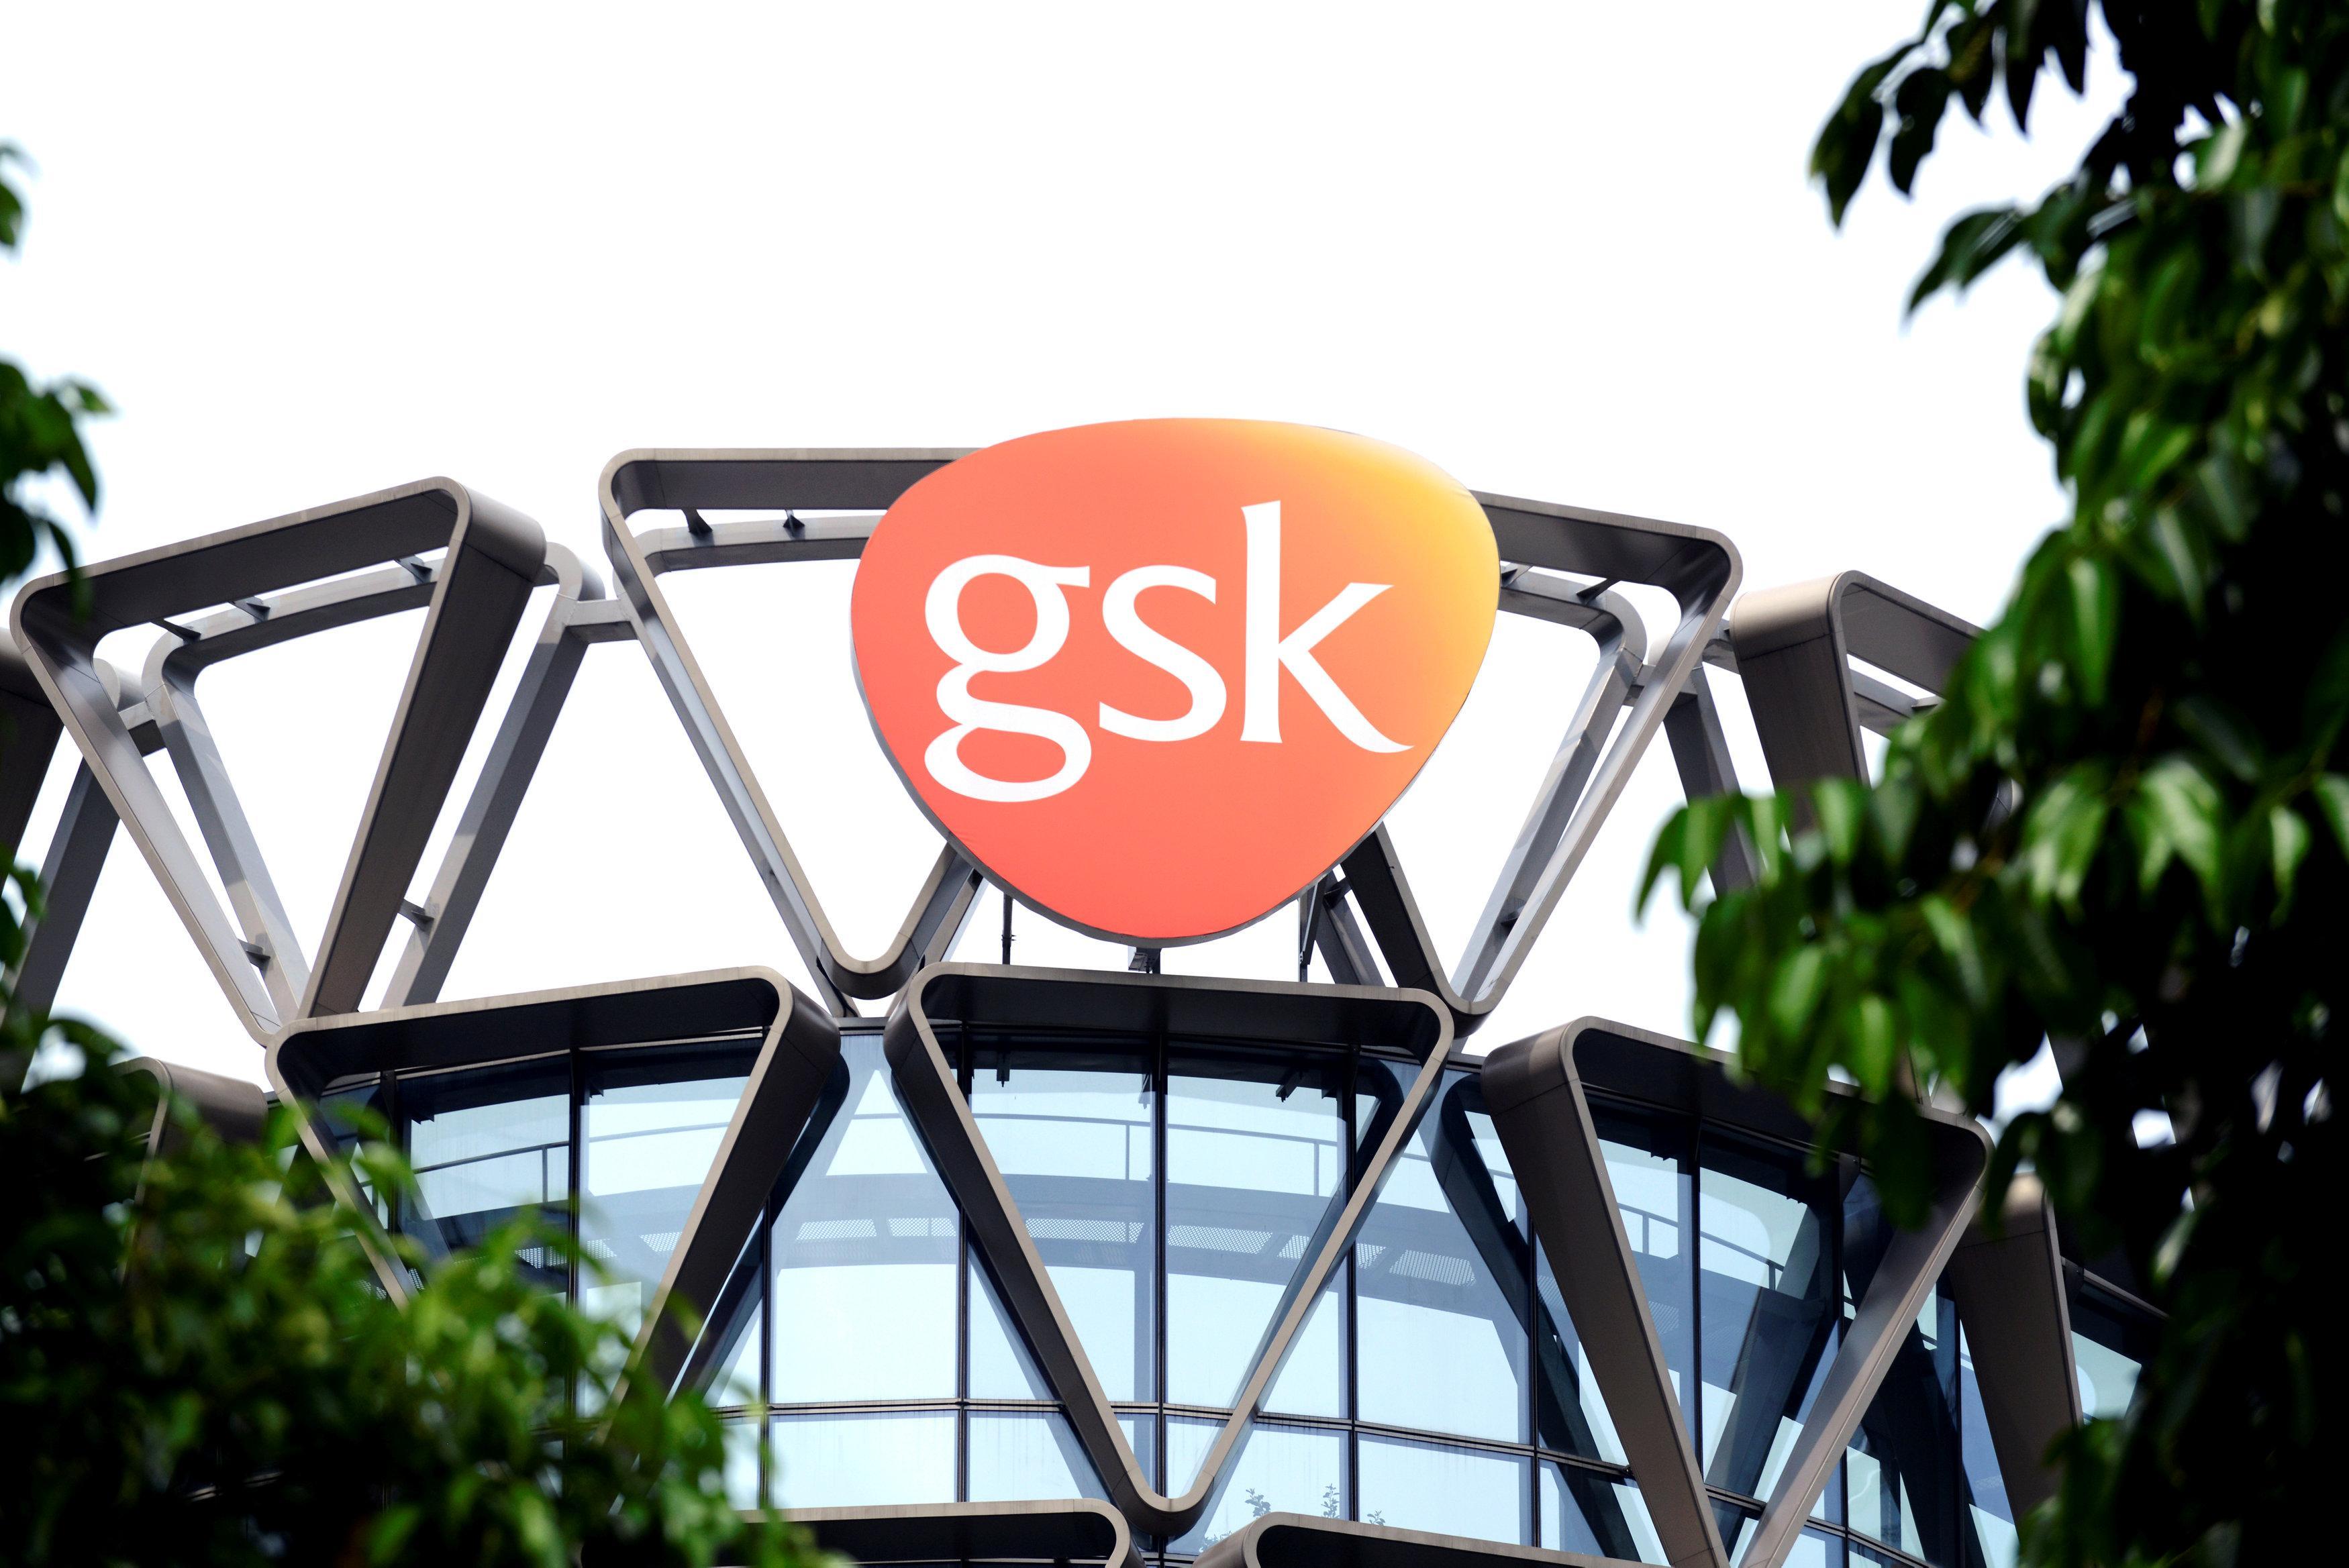 GSK buys out Novartis in $13 billion consumer healthcare